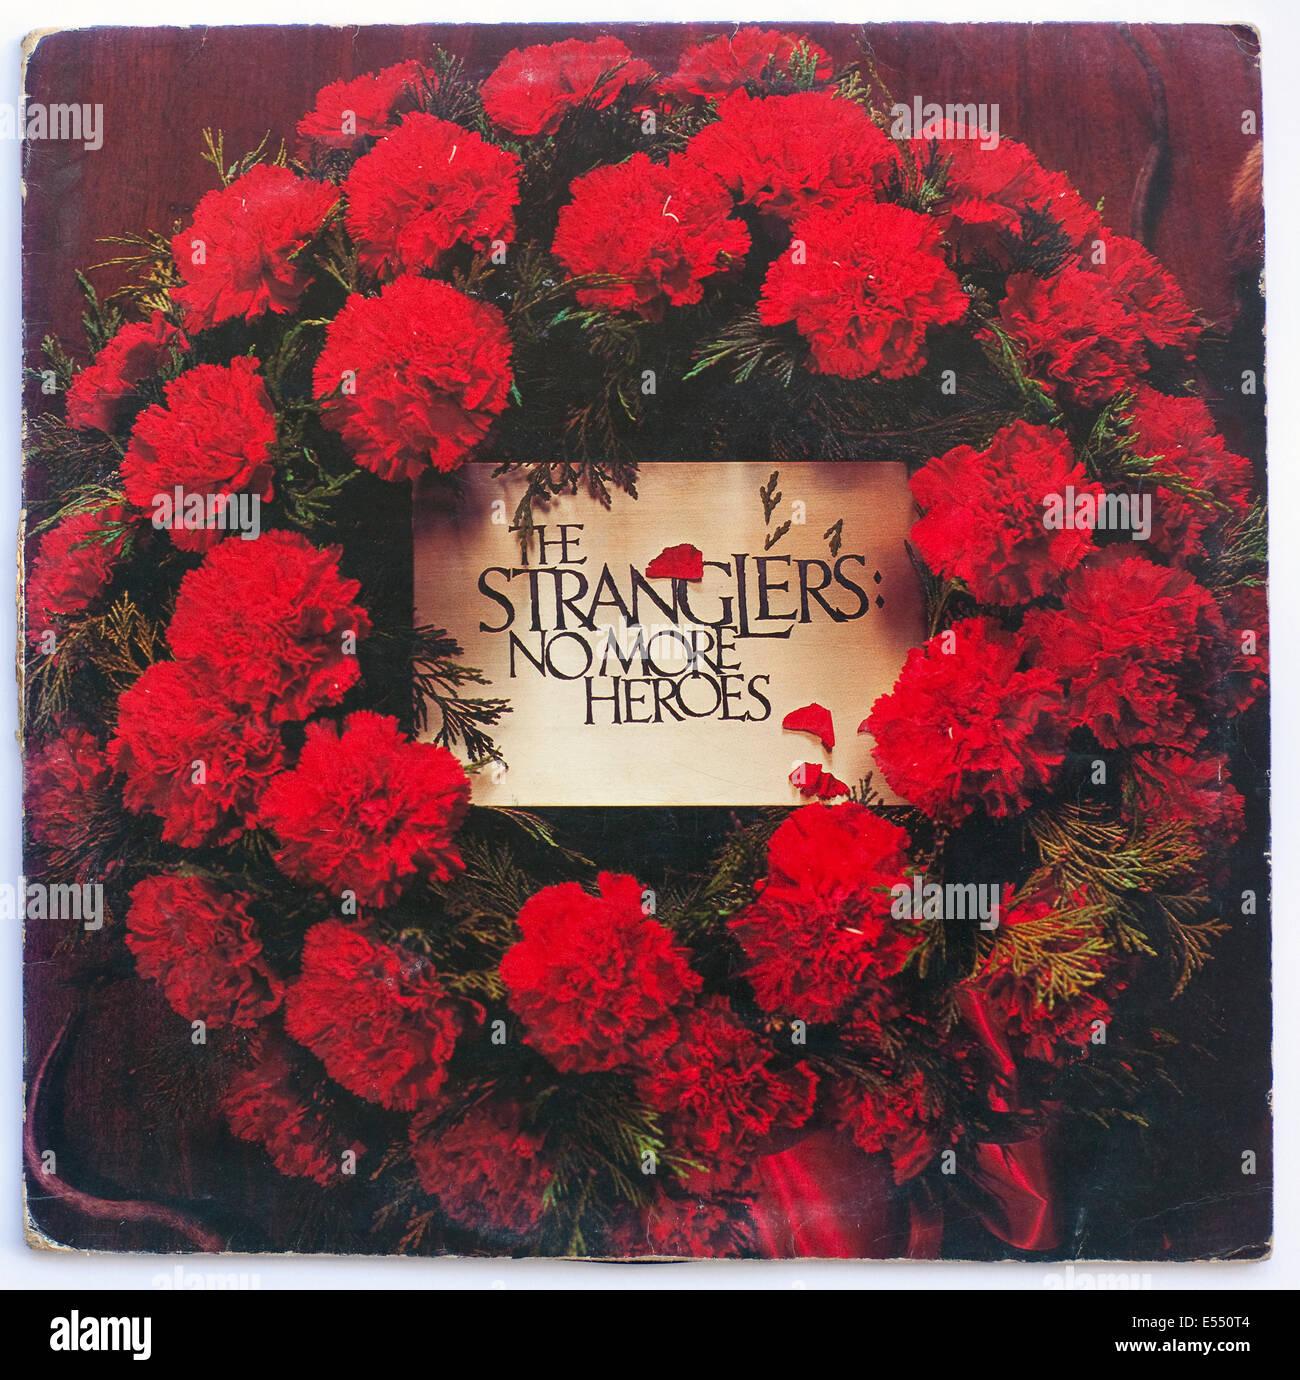 Les STRANGLERS - no more heroes, sorti en vinyle de l'album 1977 sur united records Photo Stock